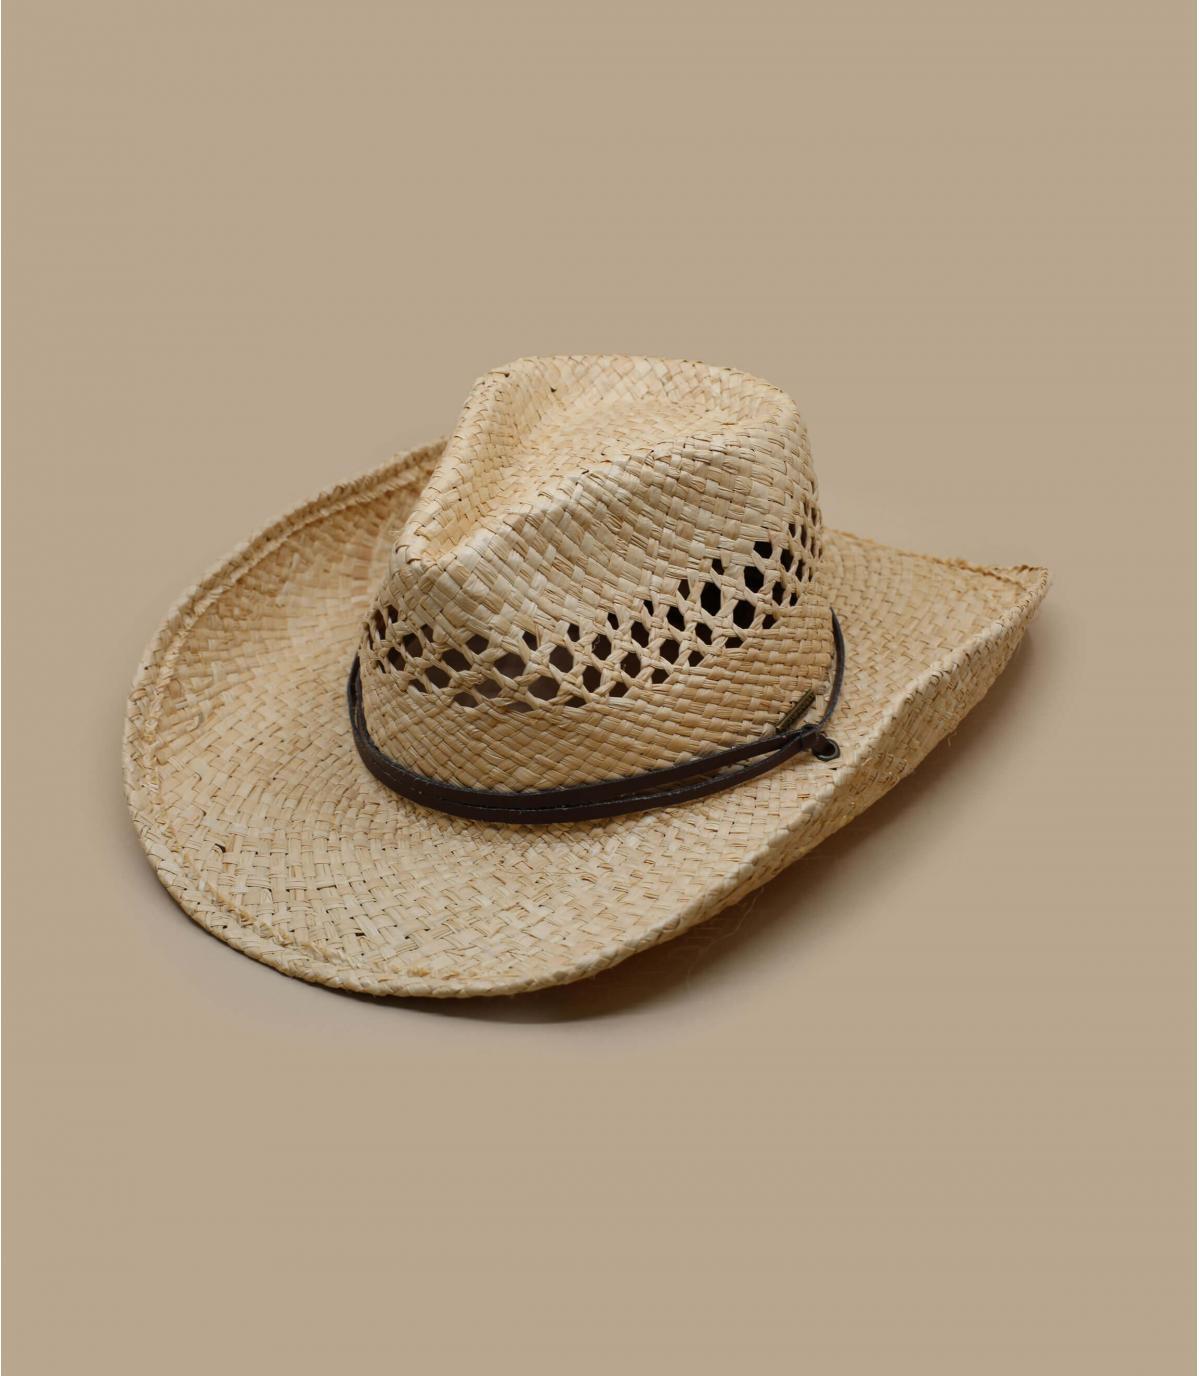 660777b3f5892 Sombrero Cowboys paja Stetson. Detalles Sombrero Larimore raffia imagen 4   Detalles Sombrero Larimore raffia imagen 1 ...